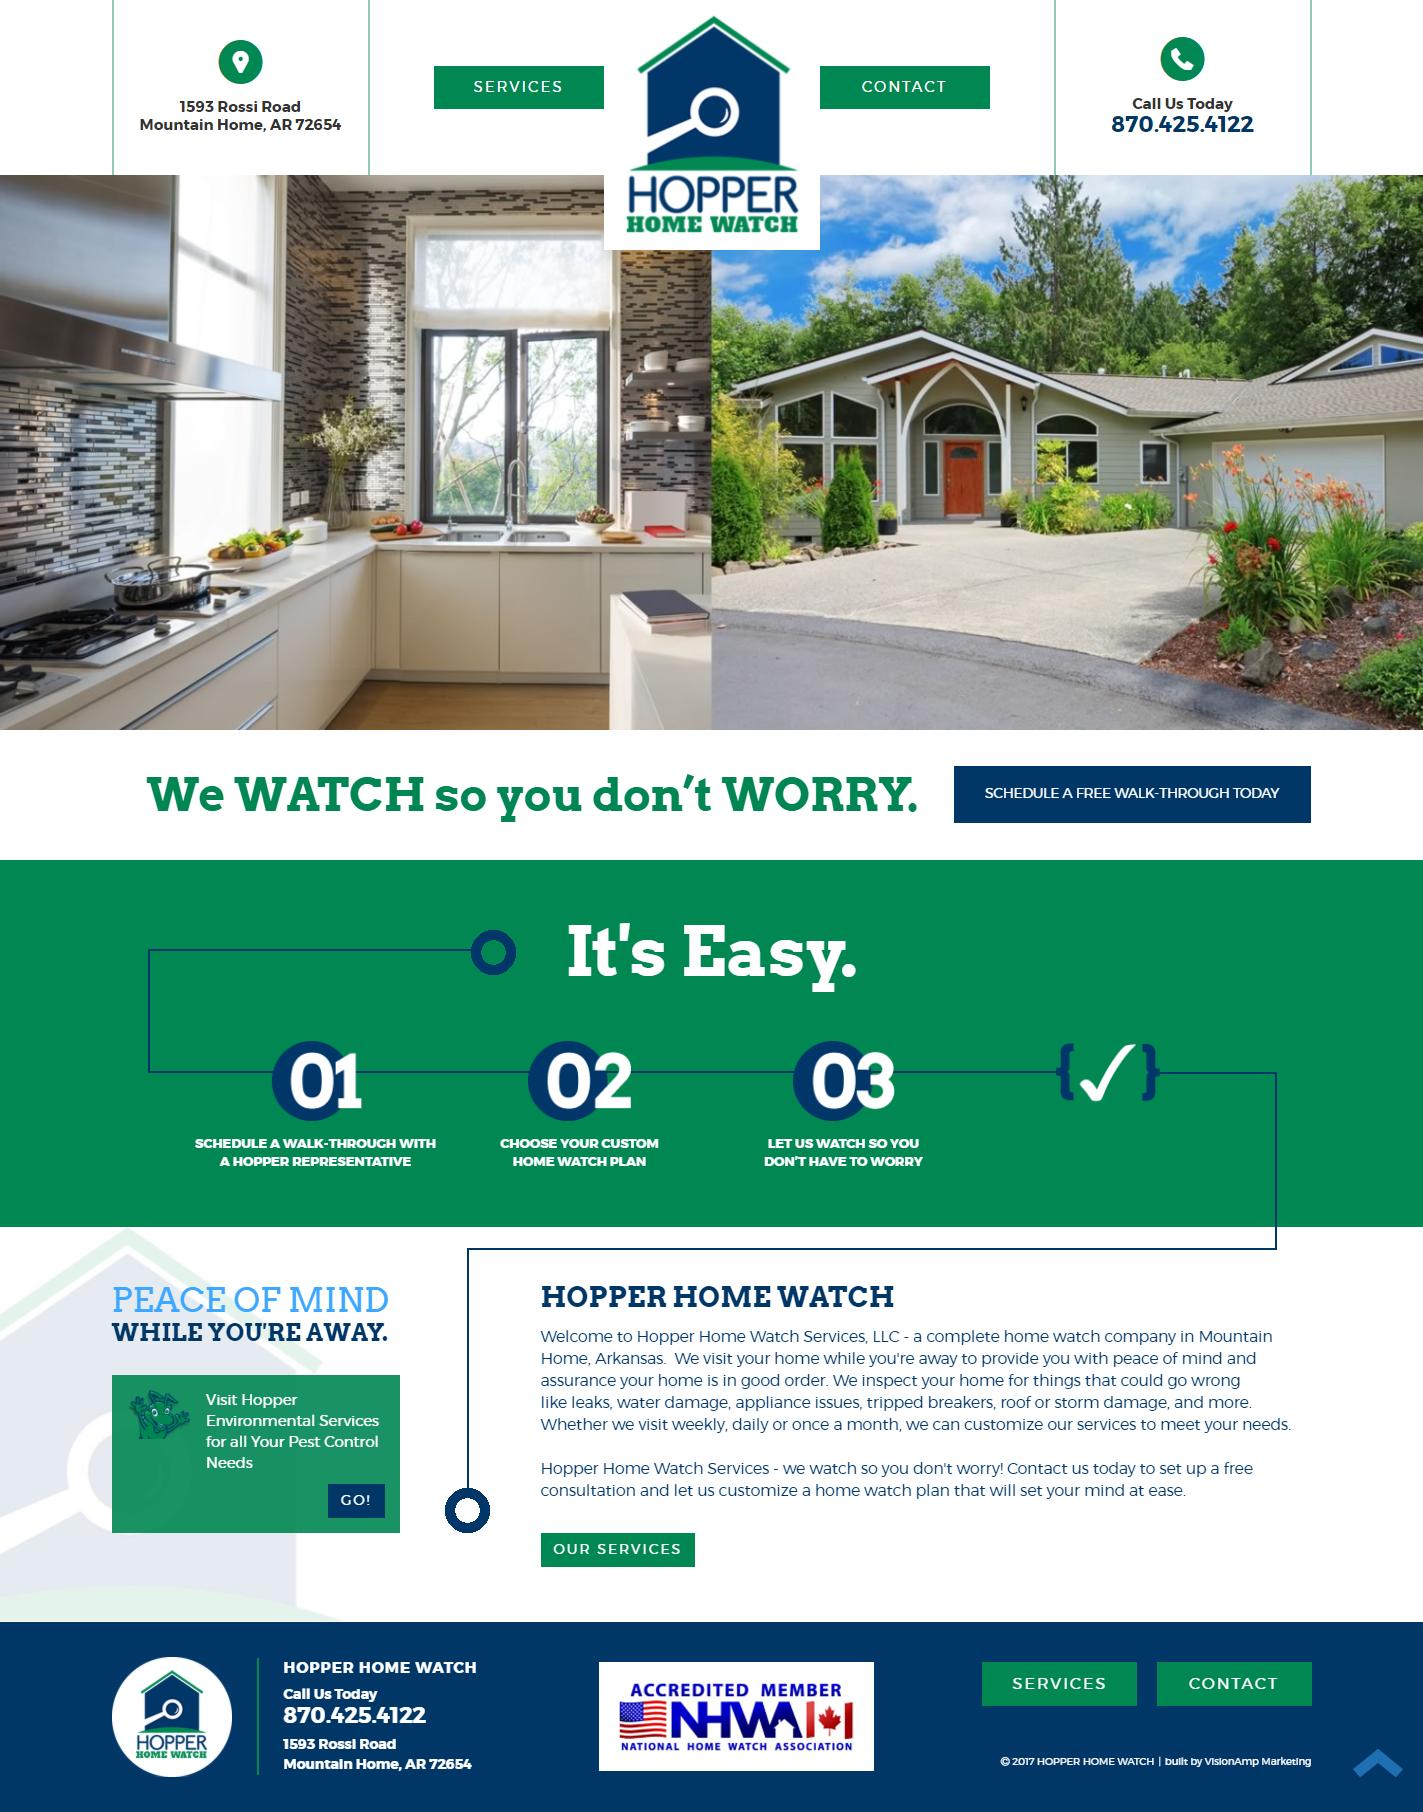 Hopper Home Watch Full Web Design Image